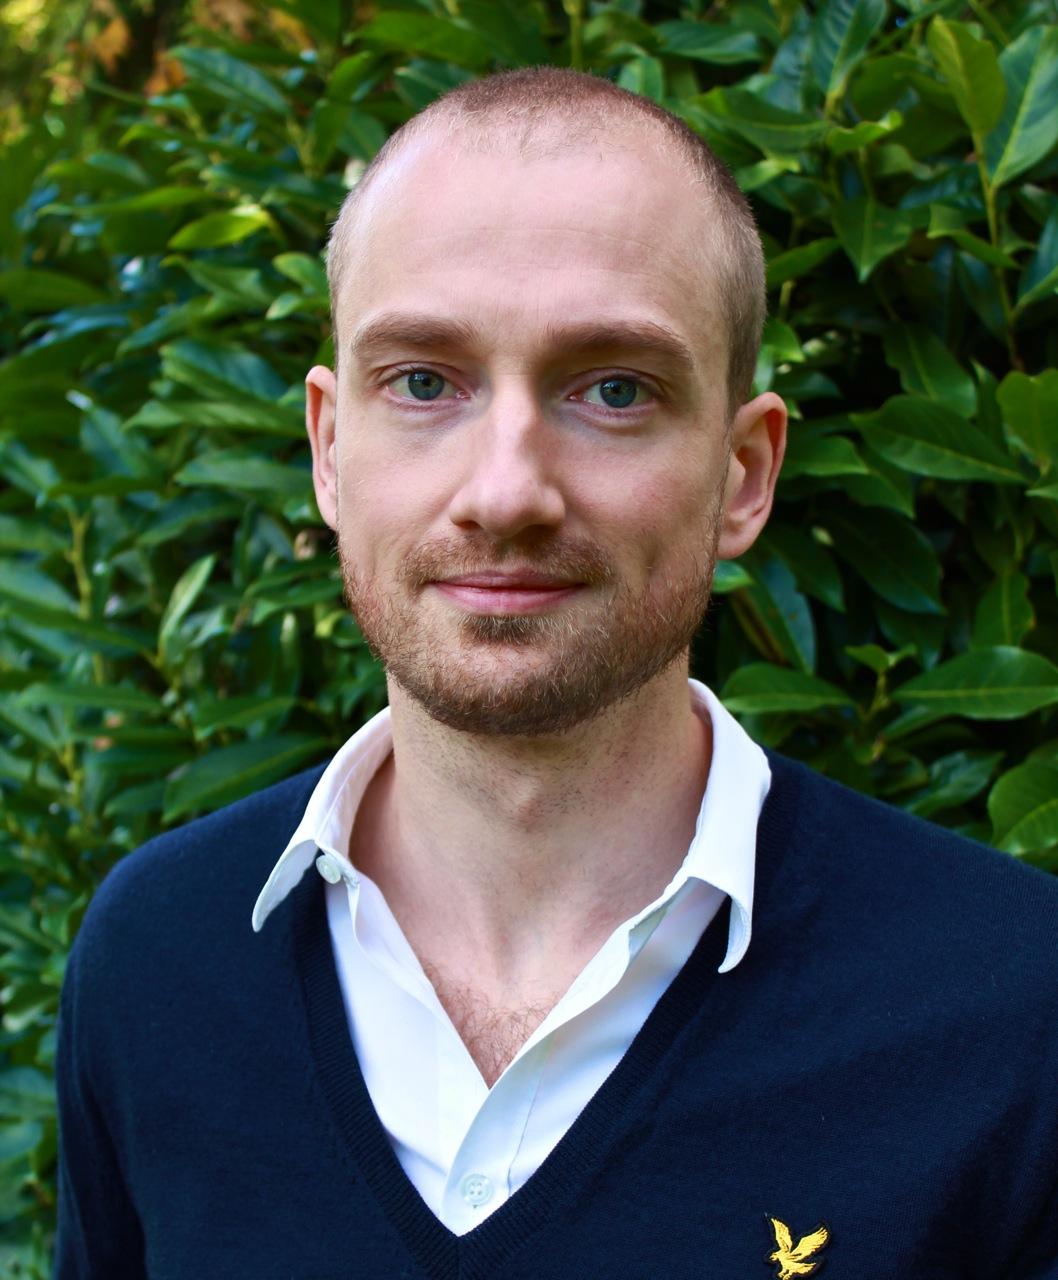 Morten Søndergaard Lindhard